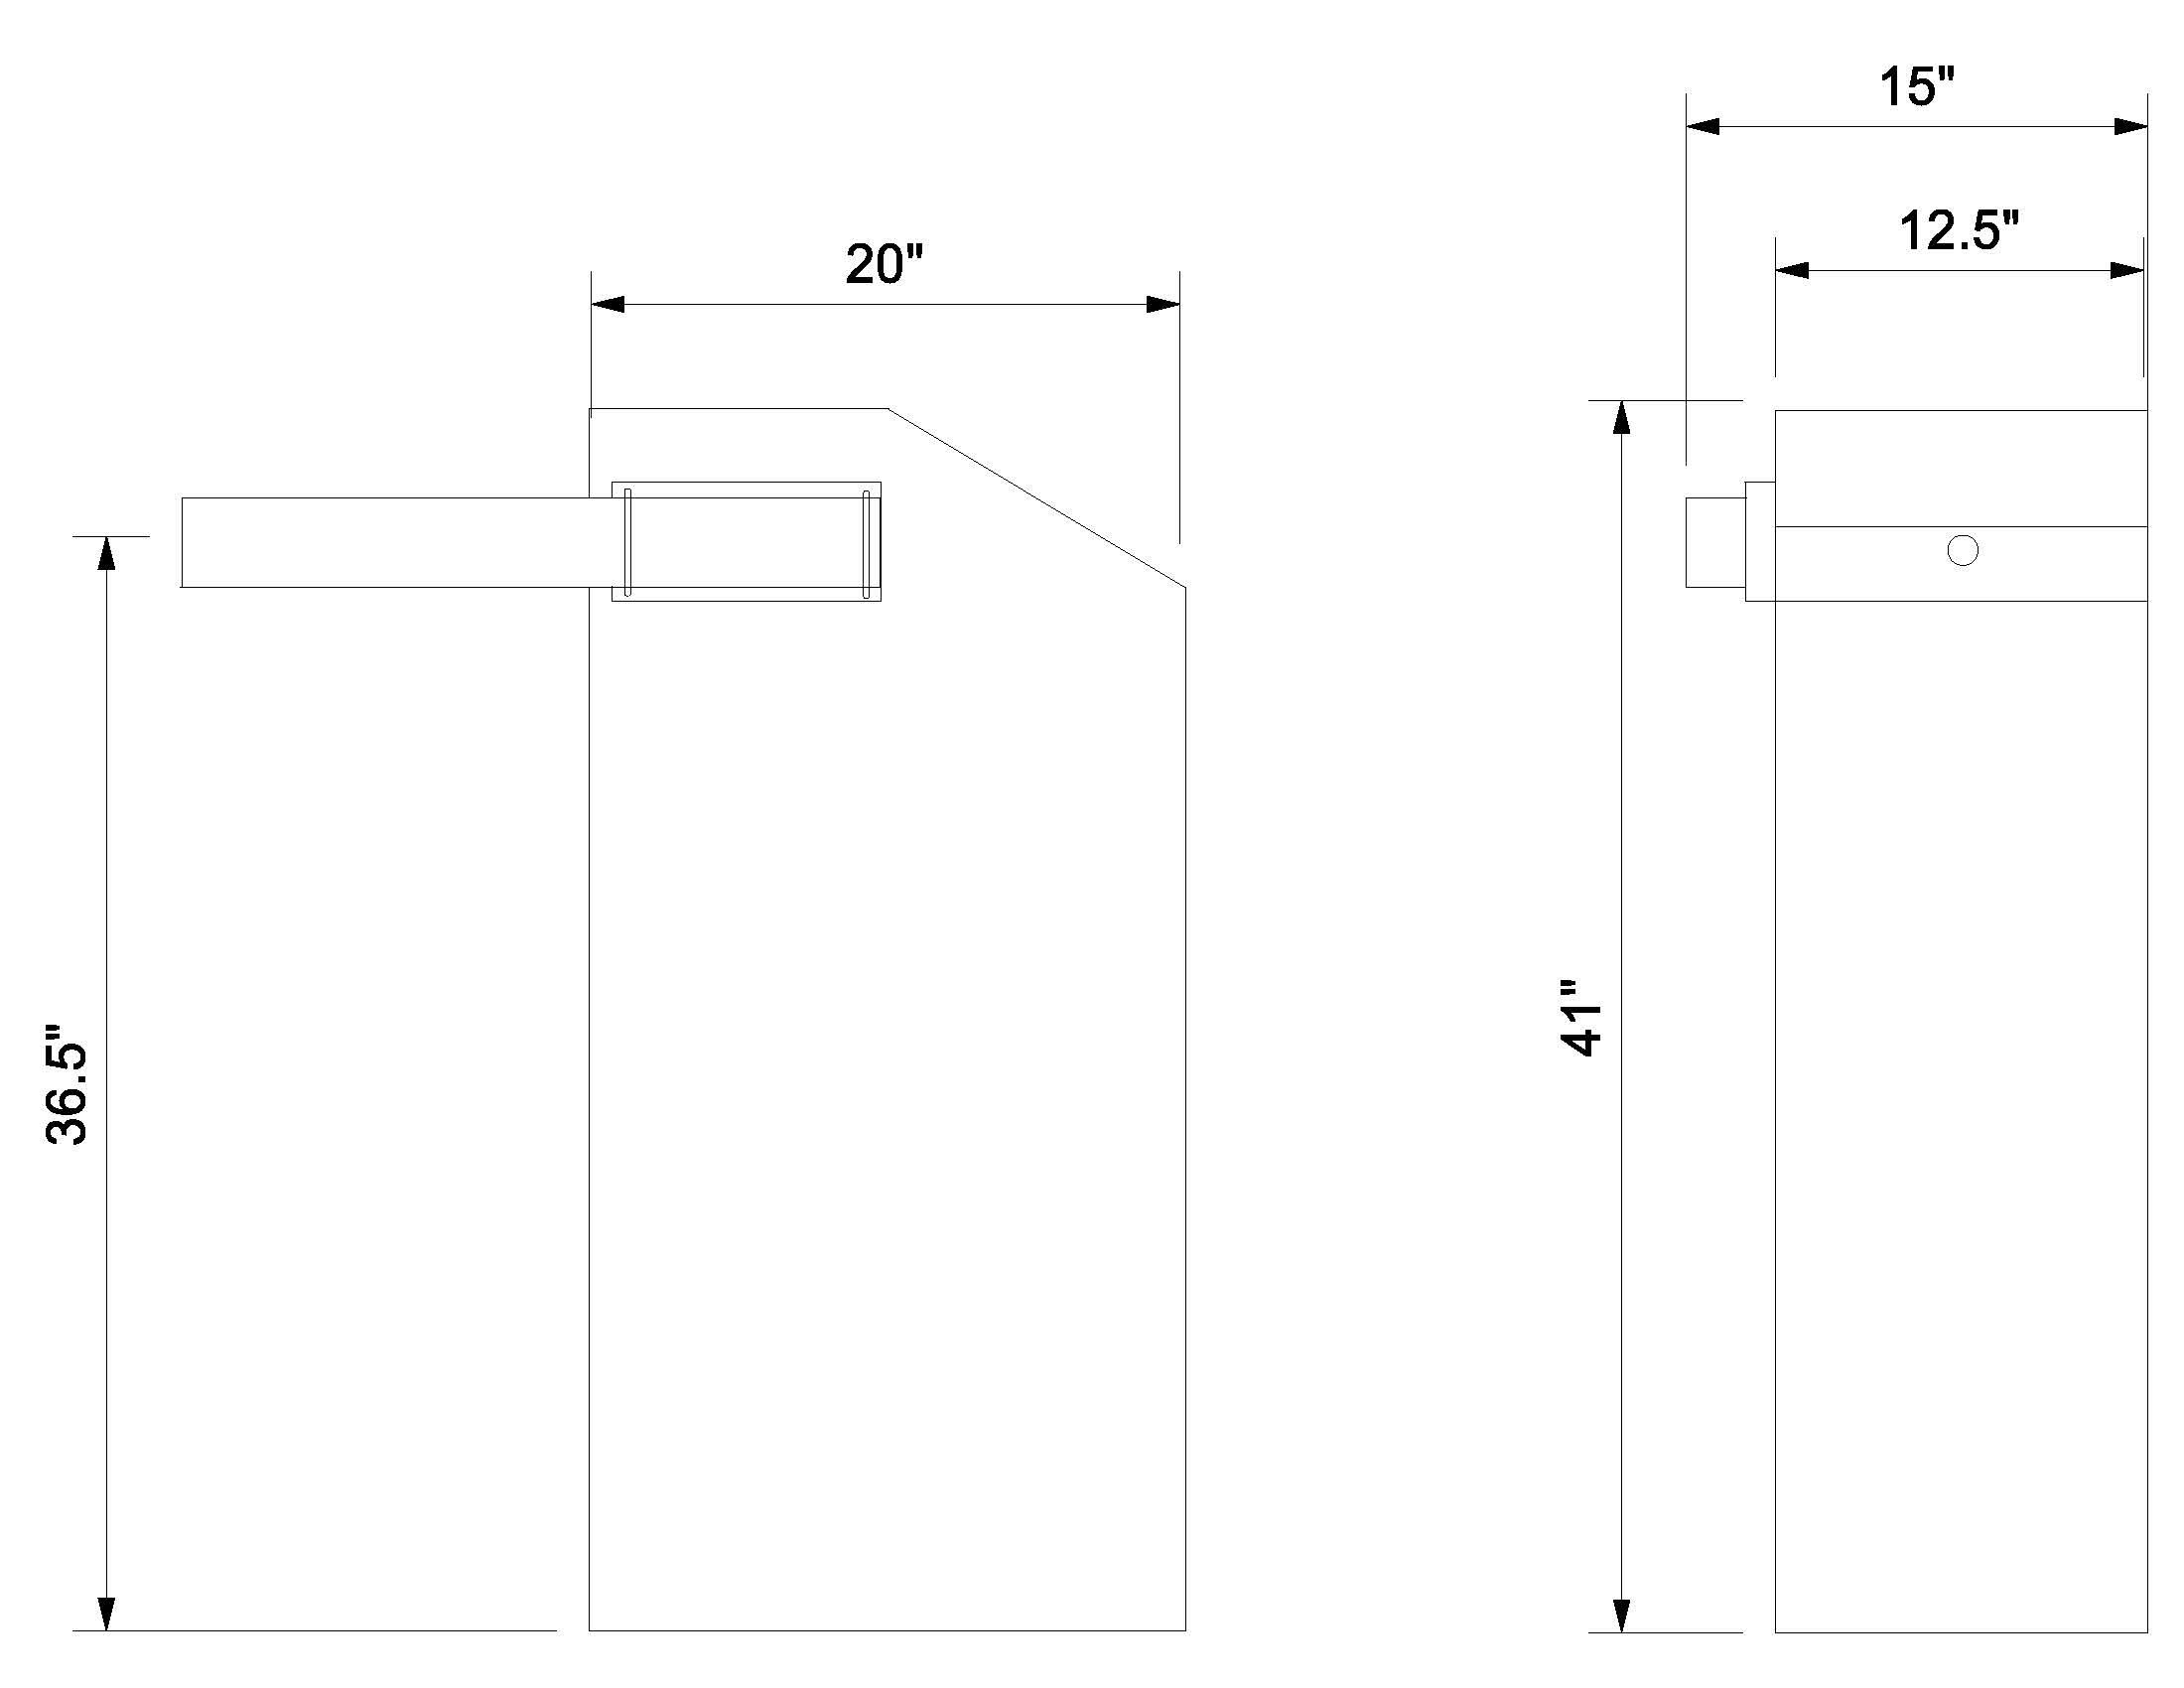 D-SBG Line Drawing